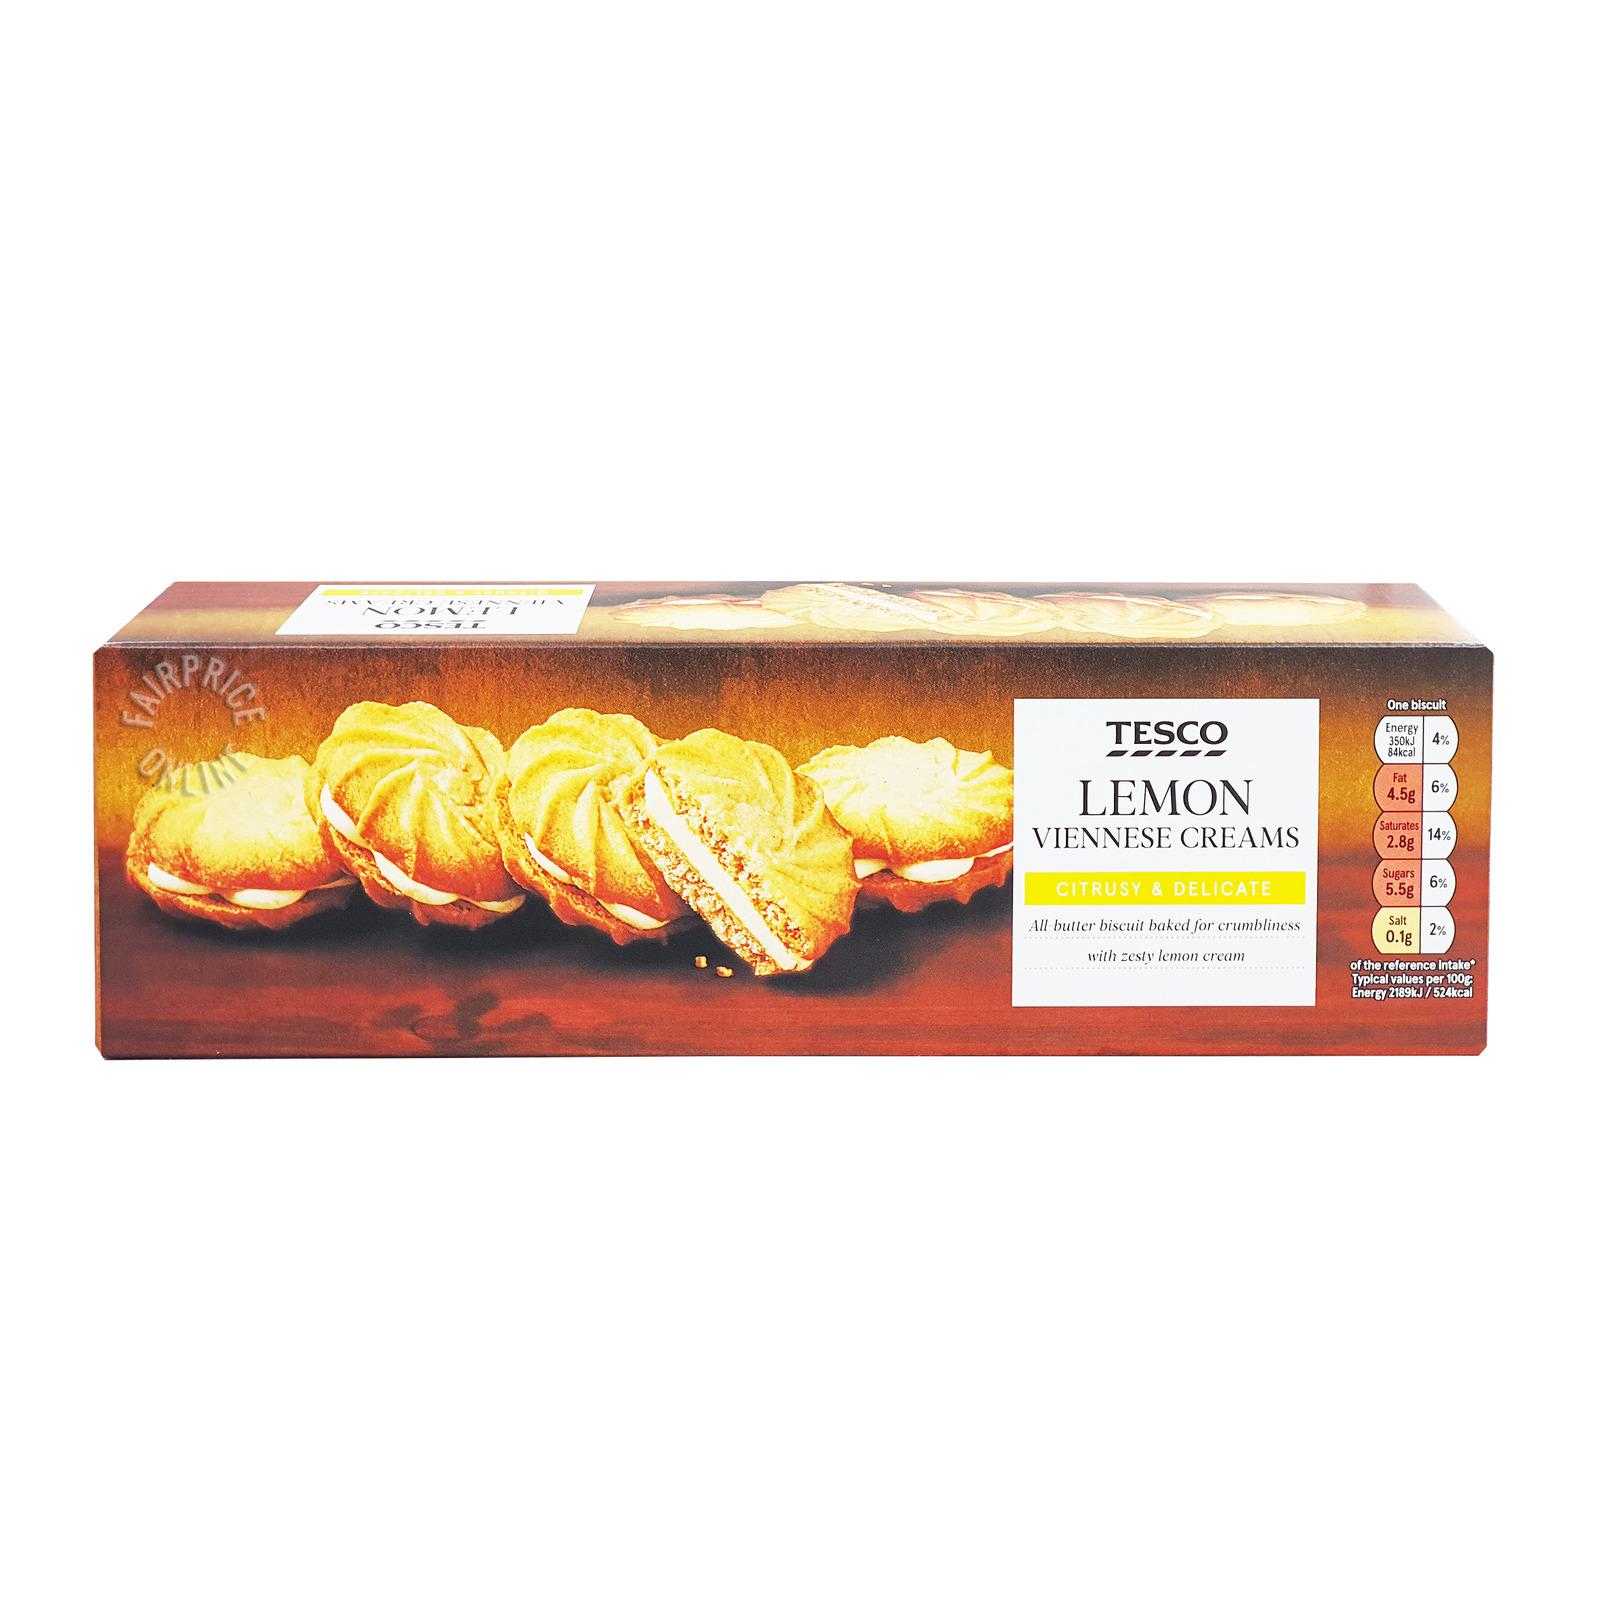 Tesco Viennese Creams Biscuits - Lemon